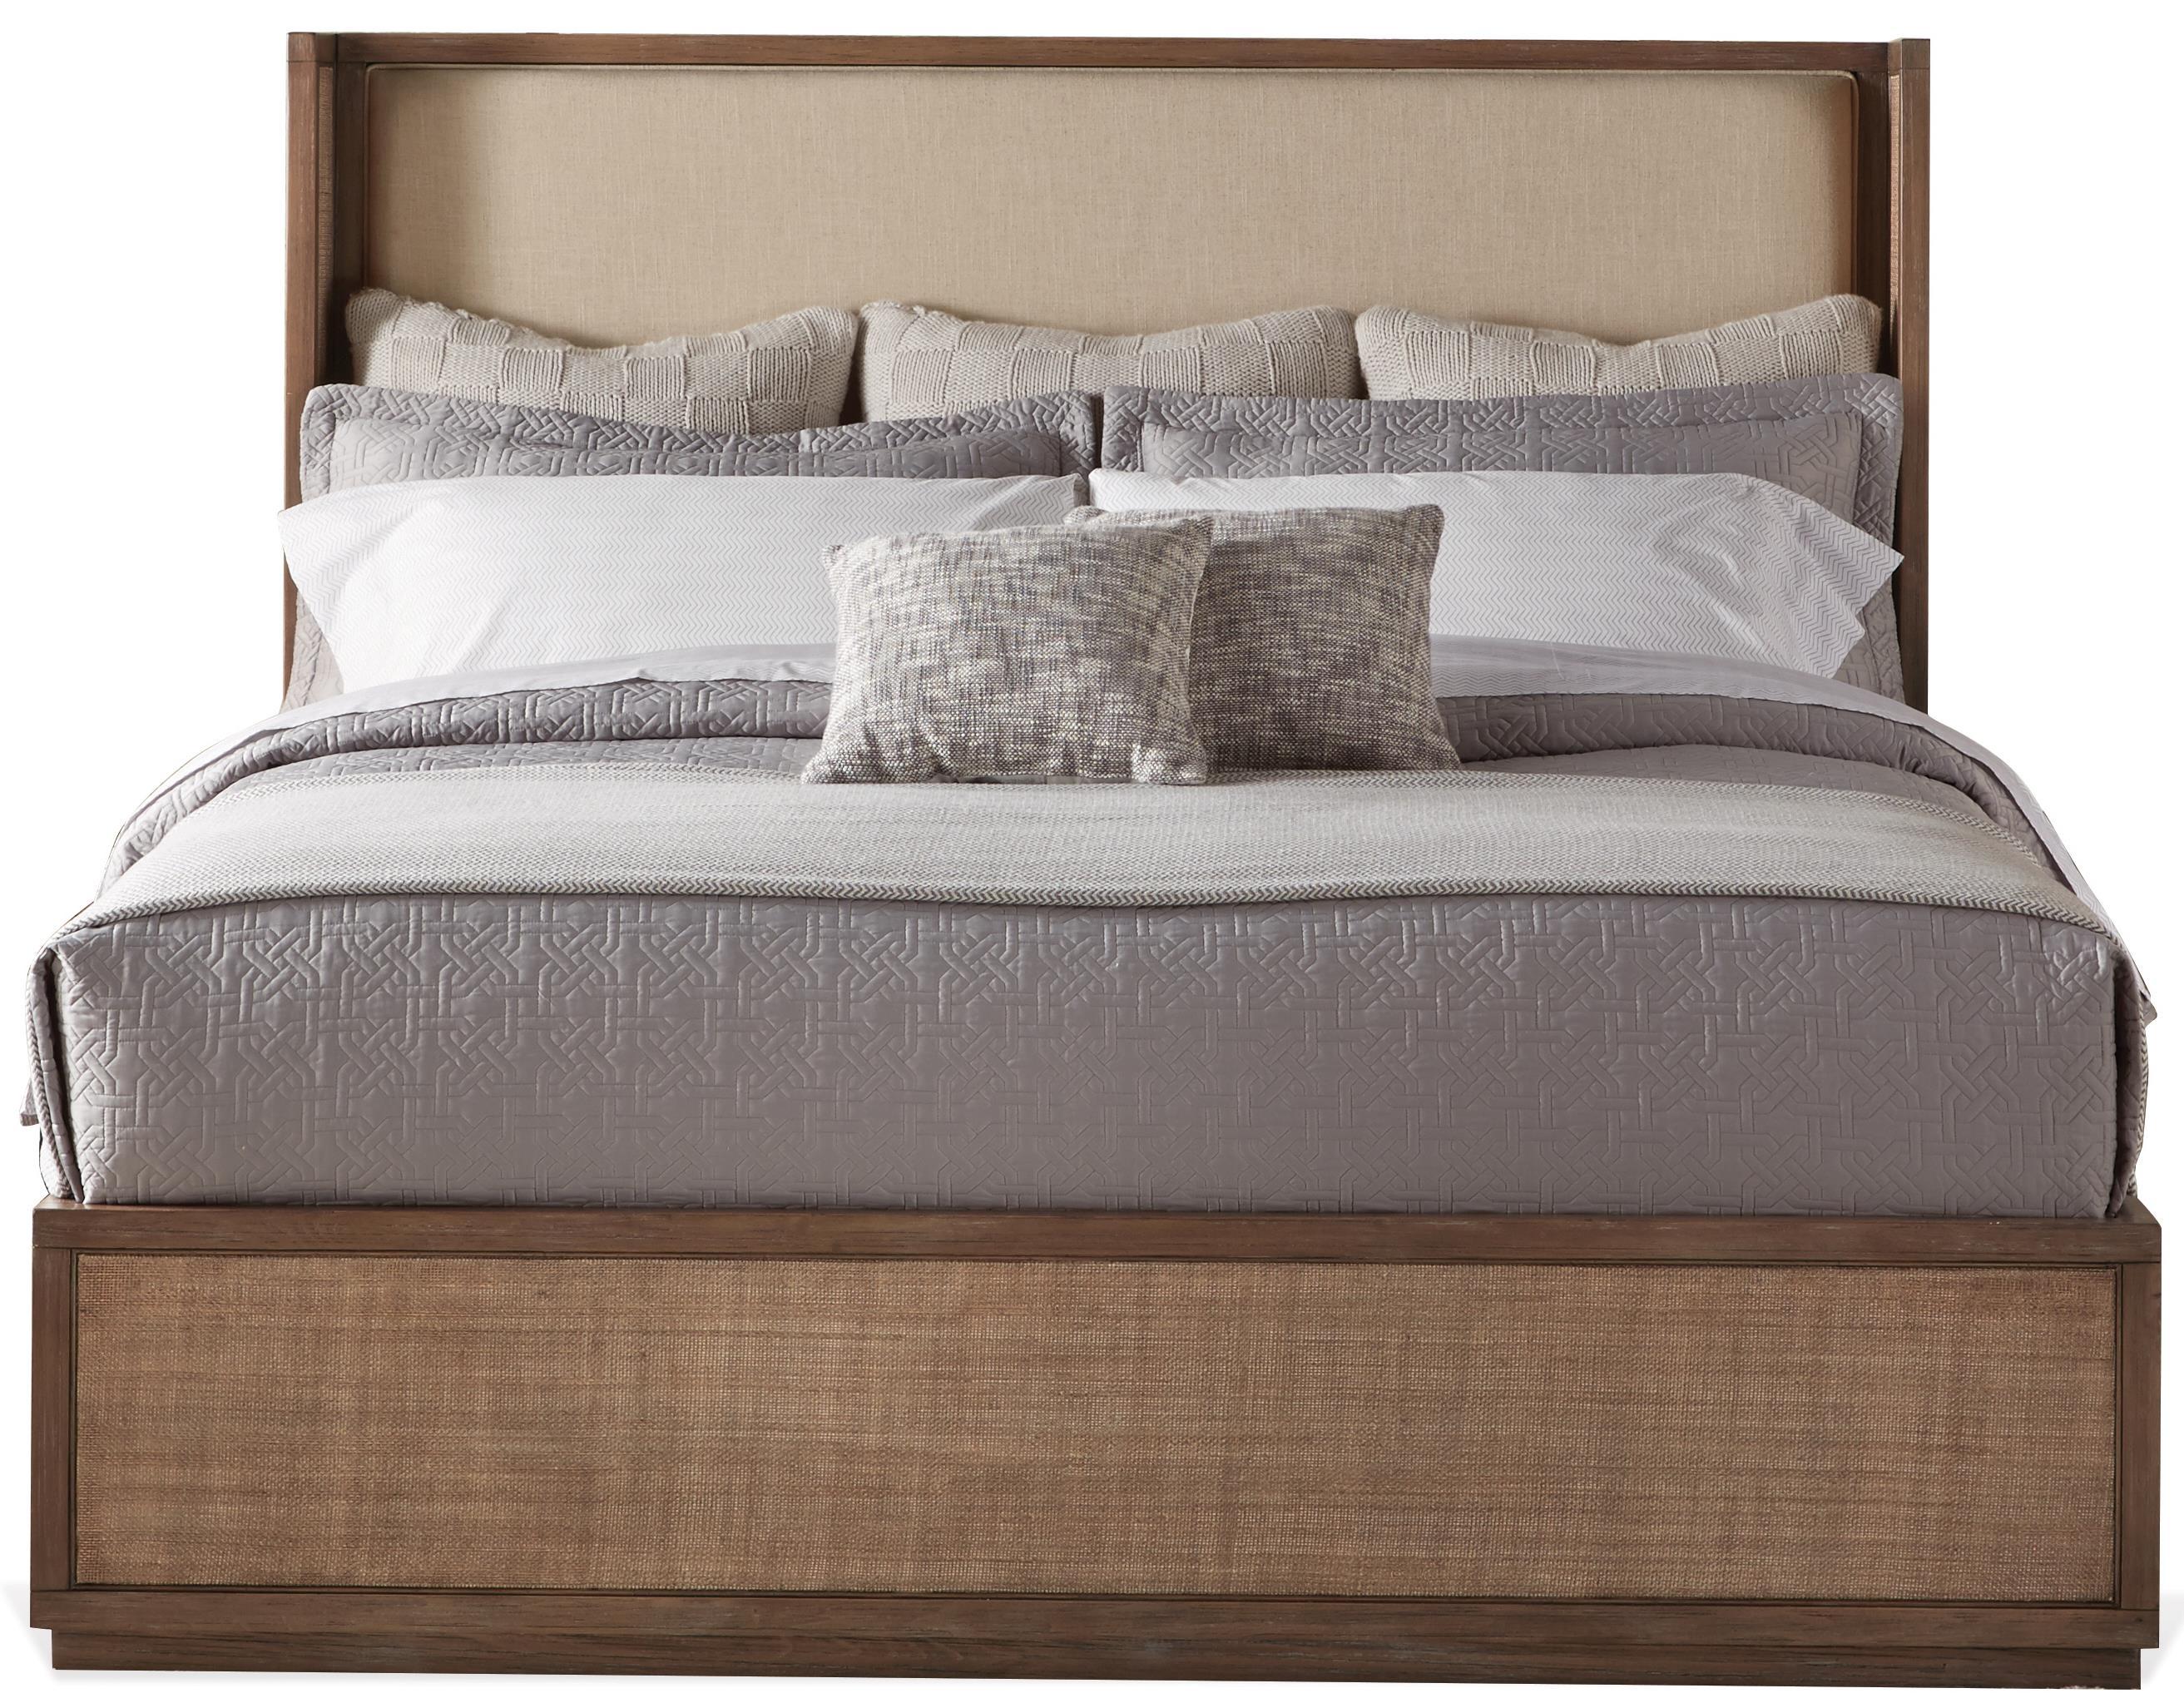 Queen Upholstered Shelter Bed